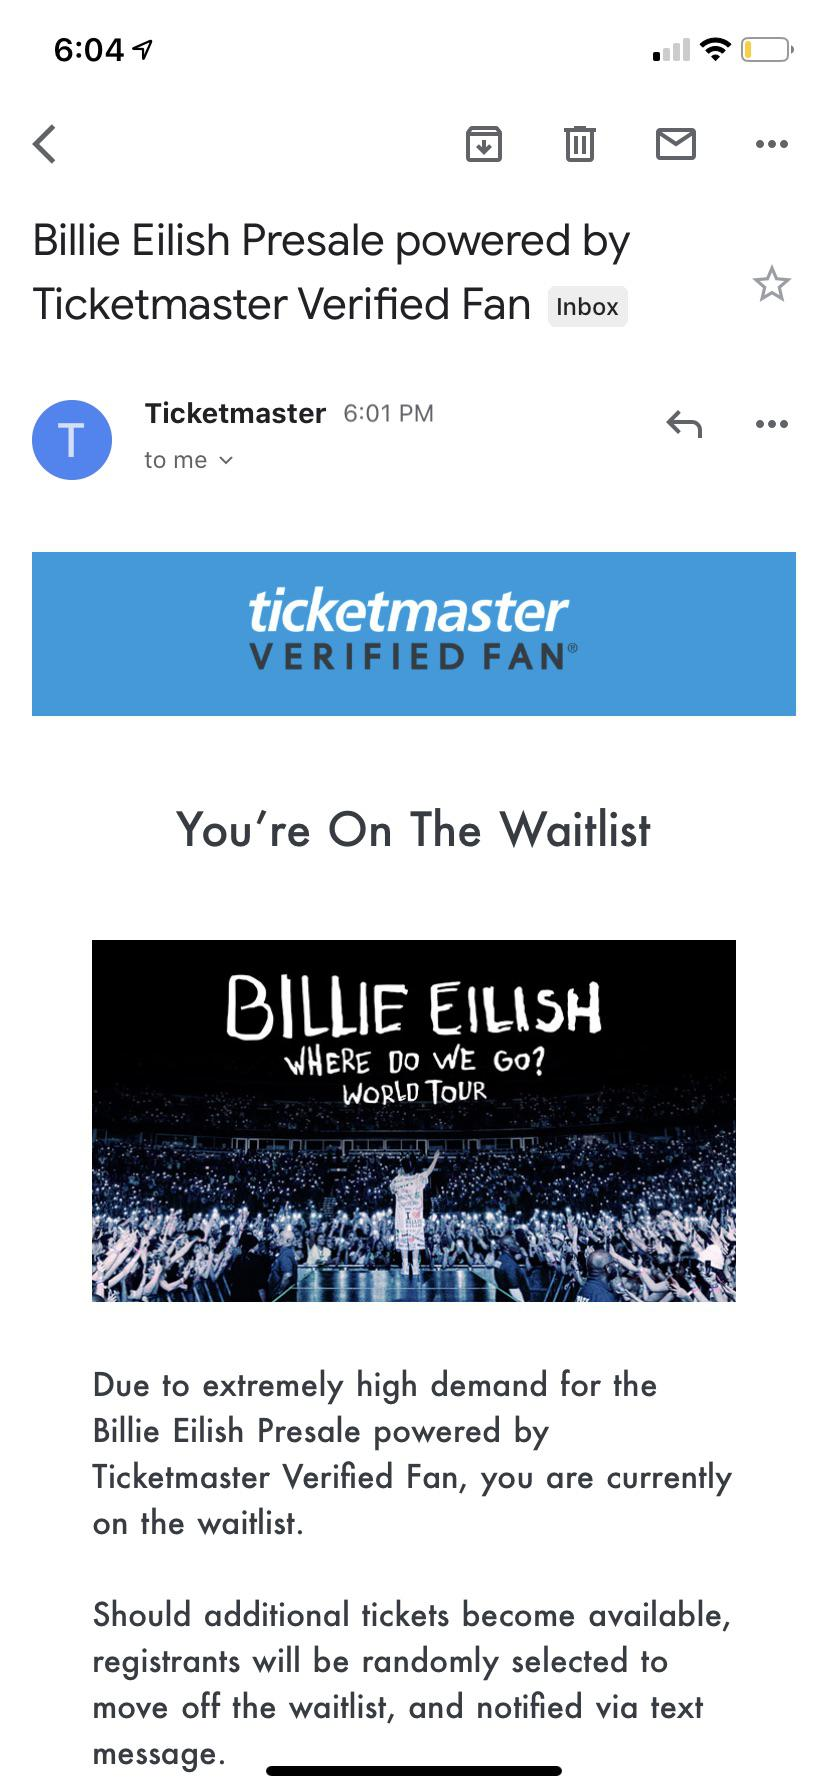 How do I register for a Verified Fan event? - Ticketmaster